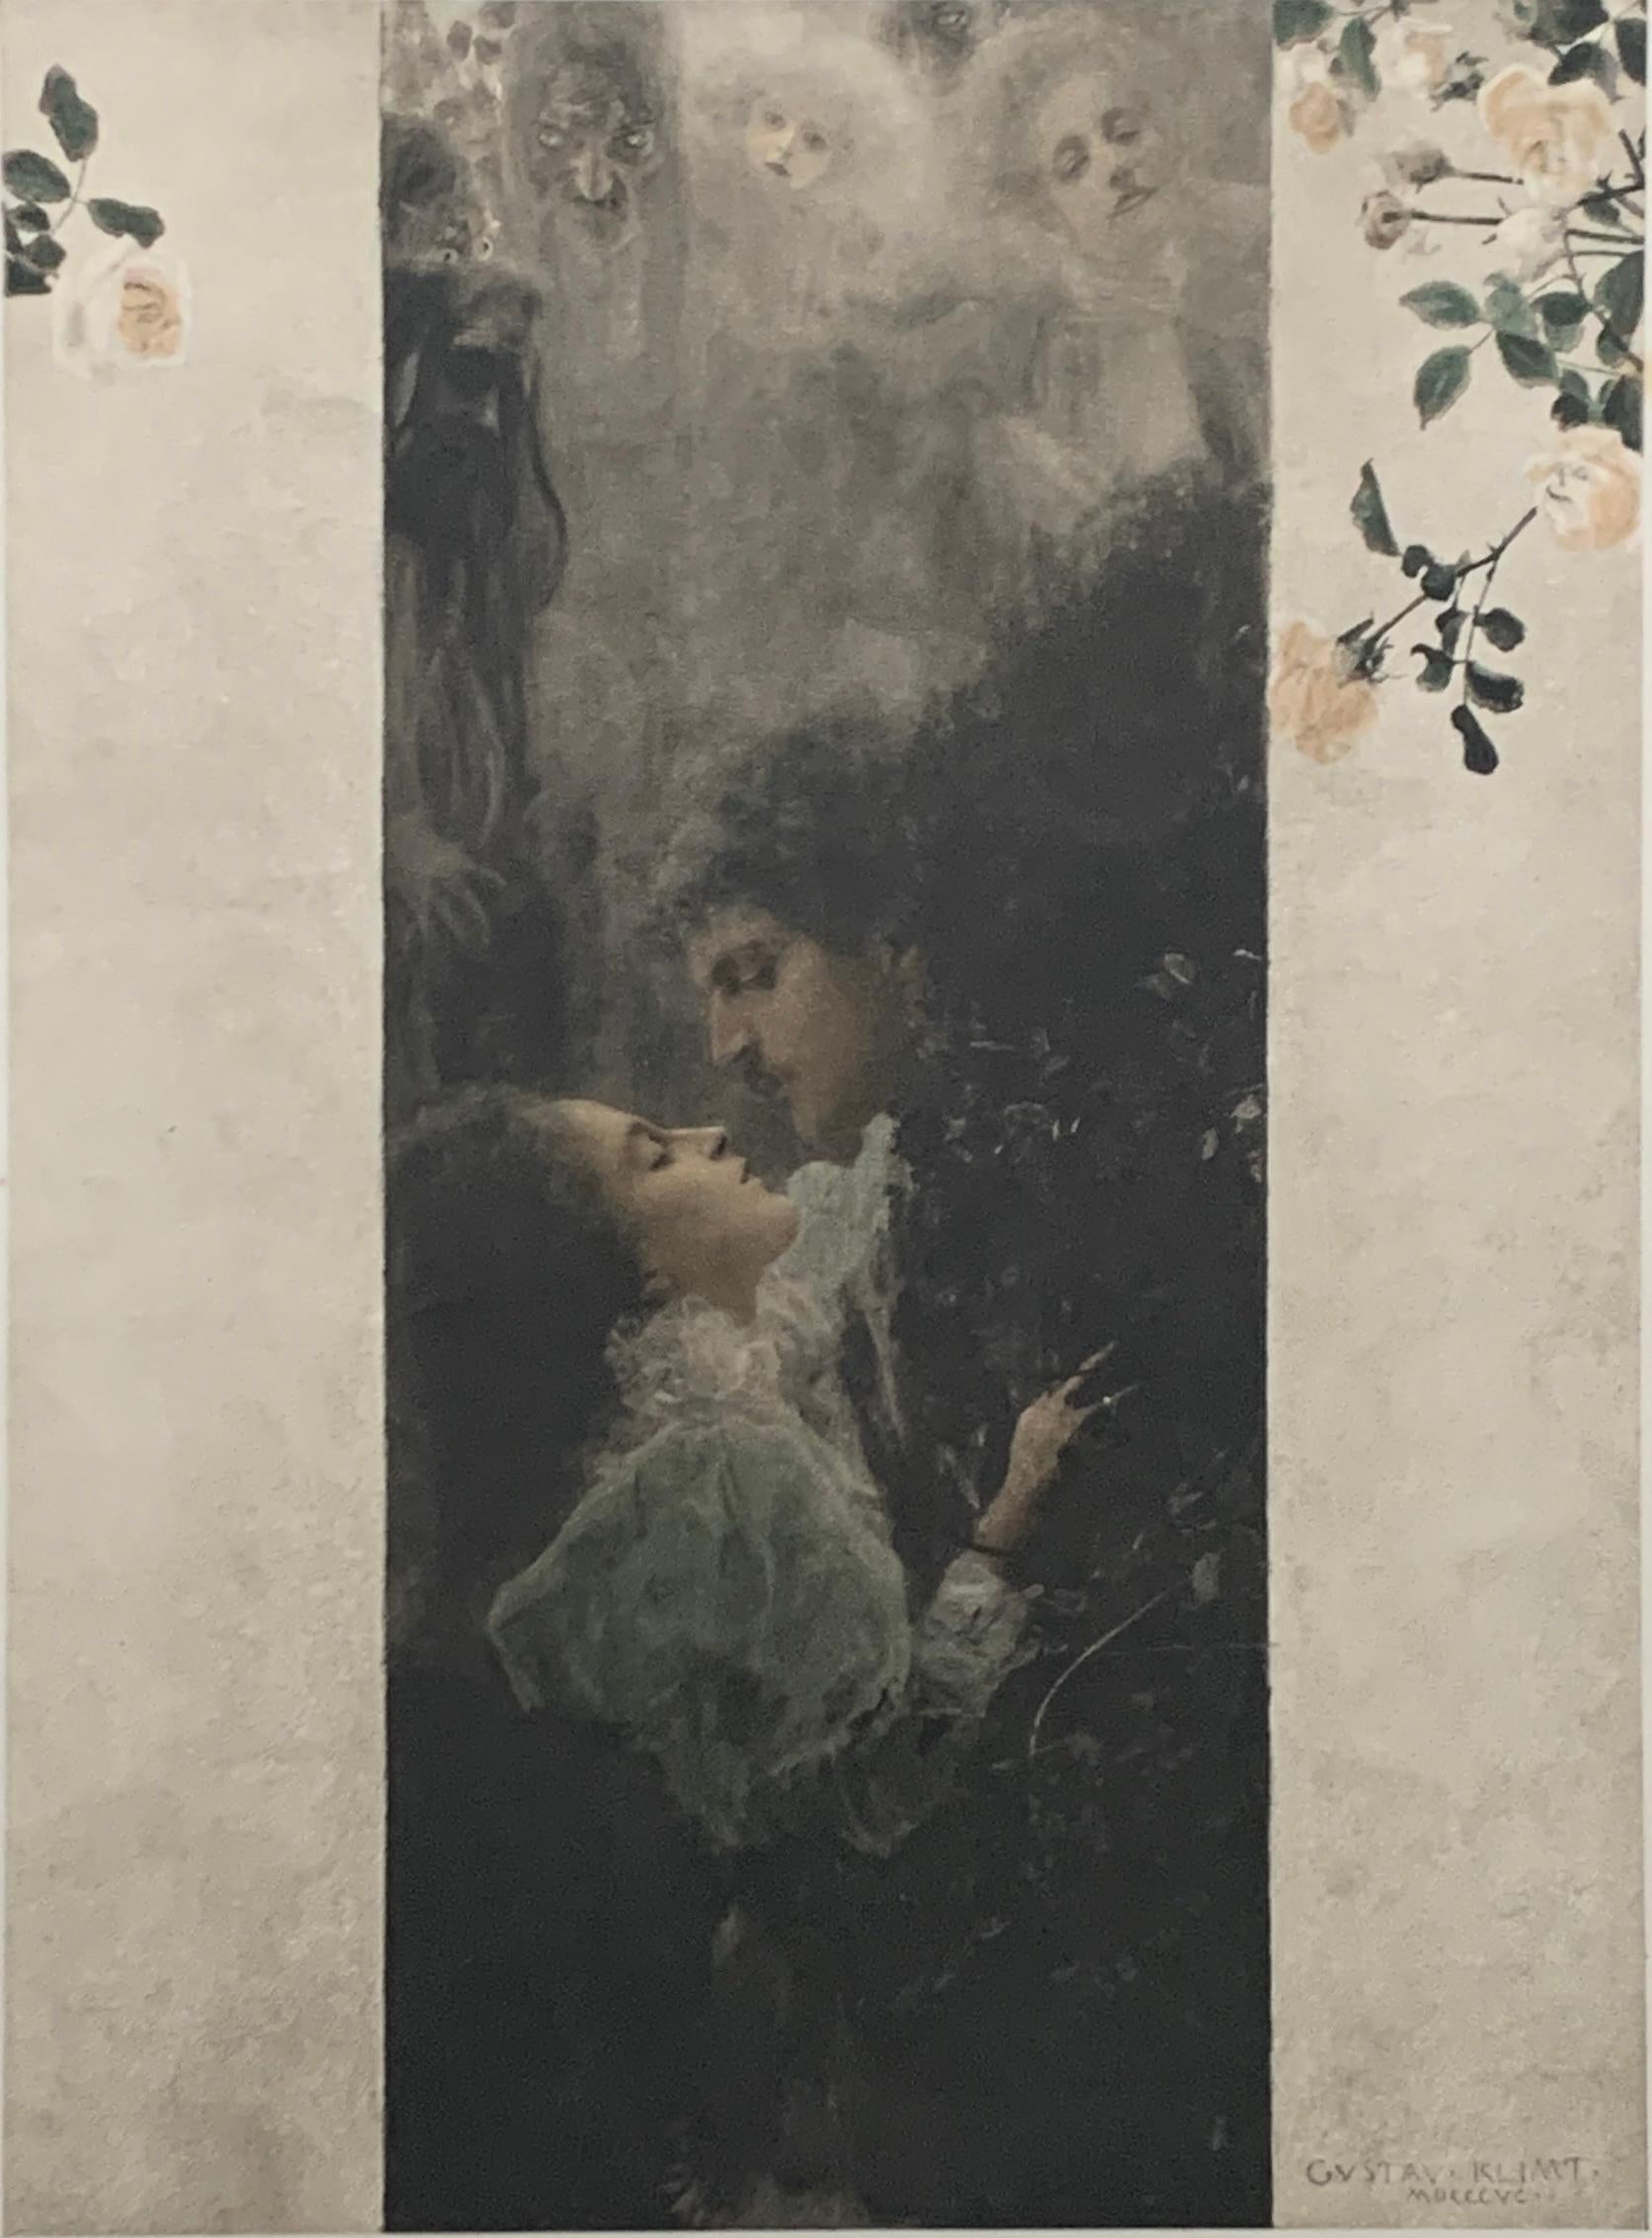 Allegorien, volumes 1-7